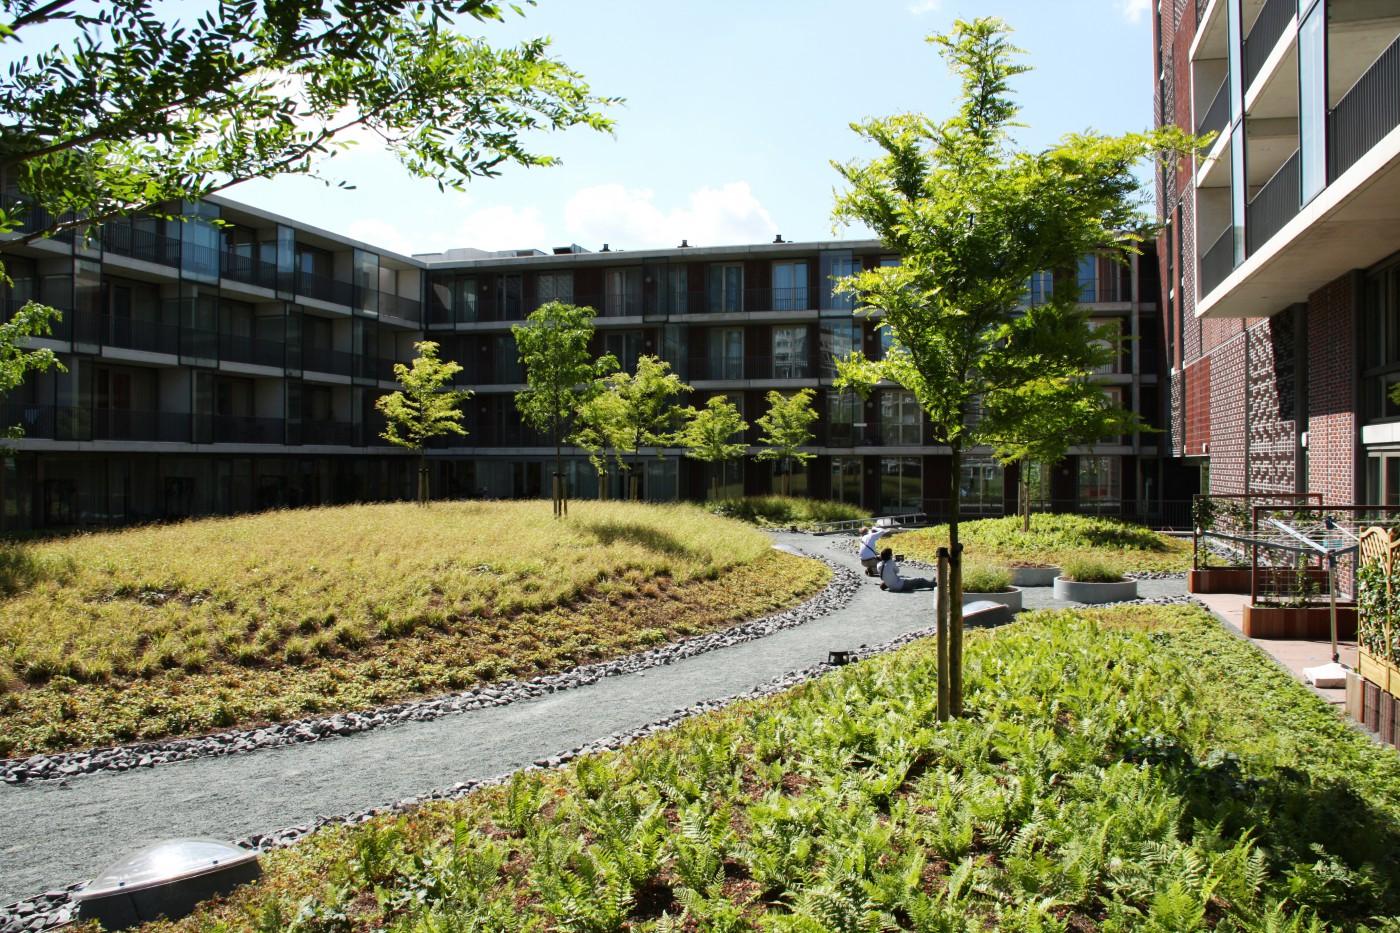 buro-sant-en-co-landschapsarchitectuur-Masira-Amsterdam-daktuin-vaste planten-heuvel